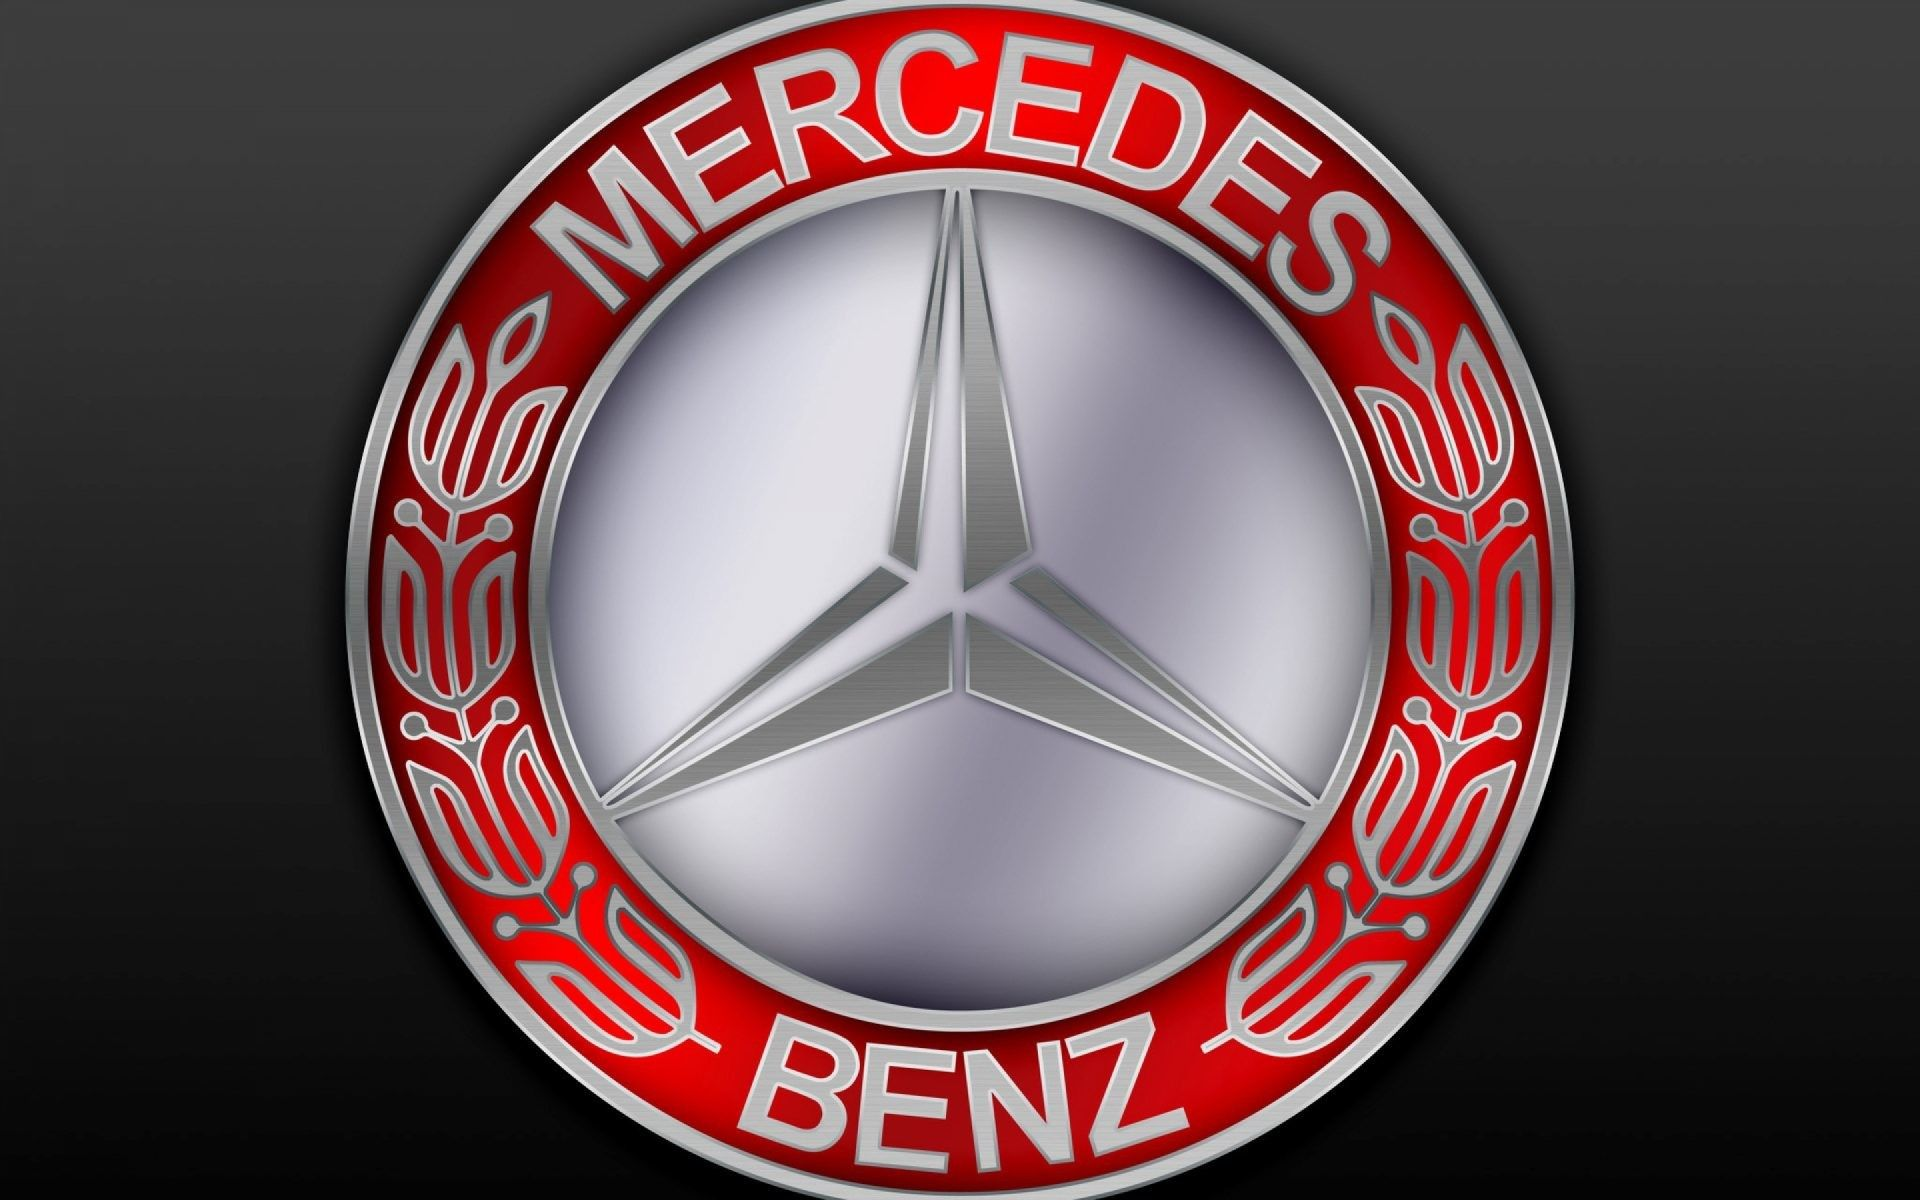 1920x1200 Mercedes Benz Logo 4k Hd Wallpaper Mercedes Benz Logo